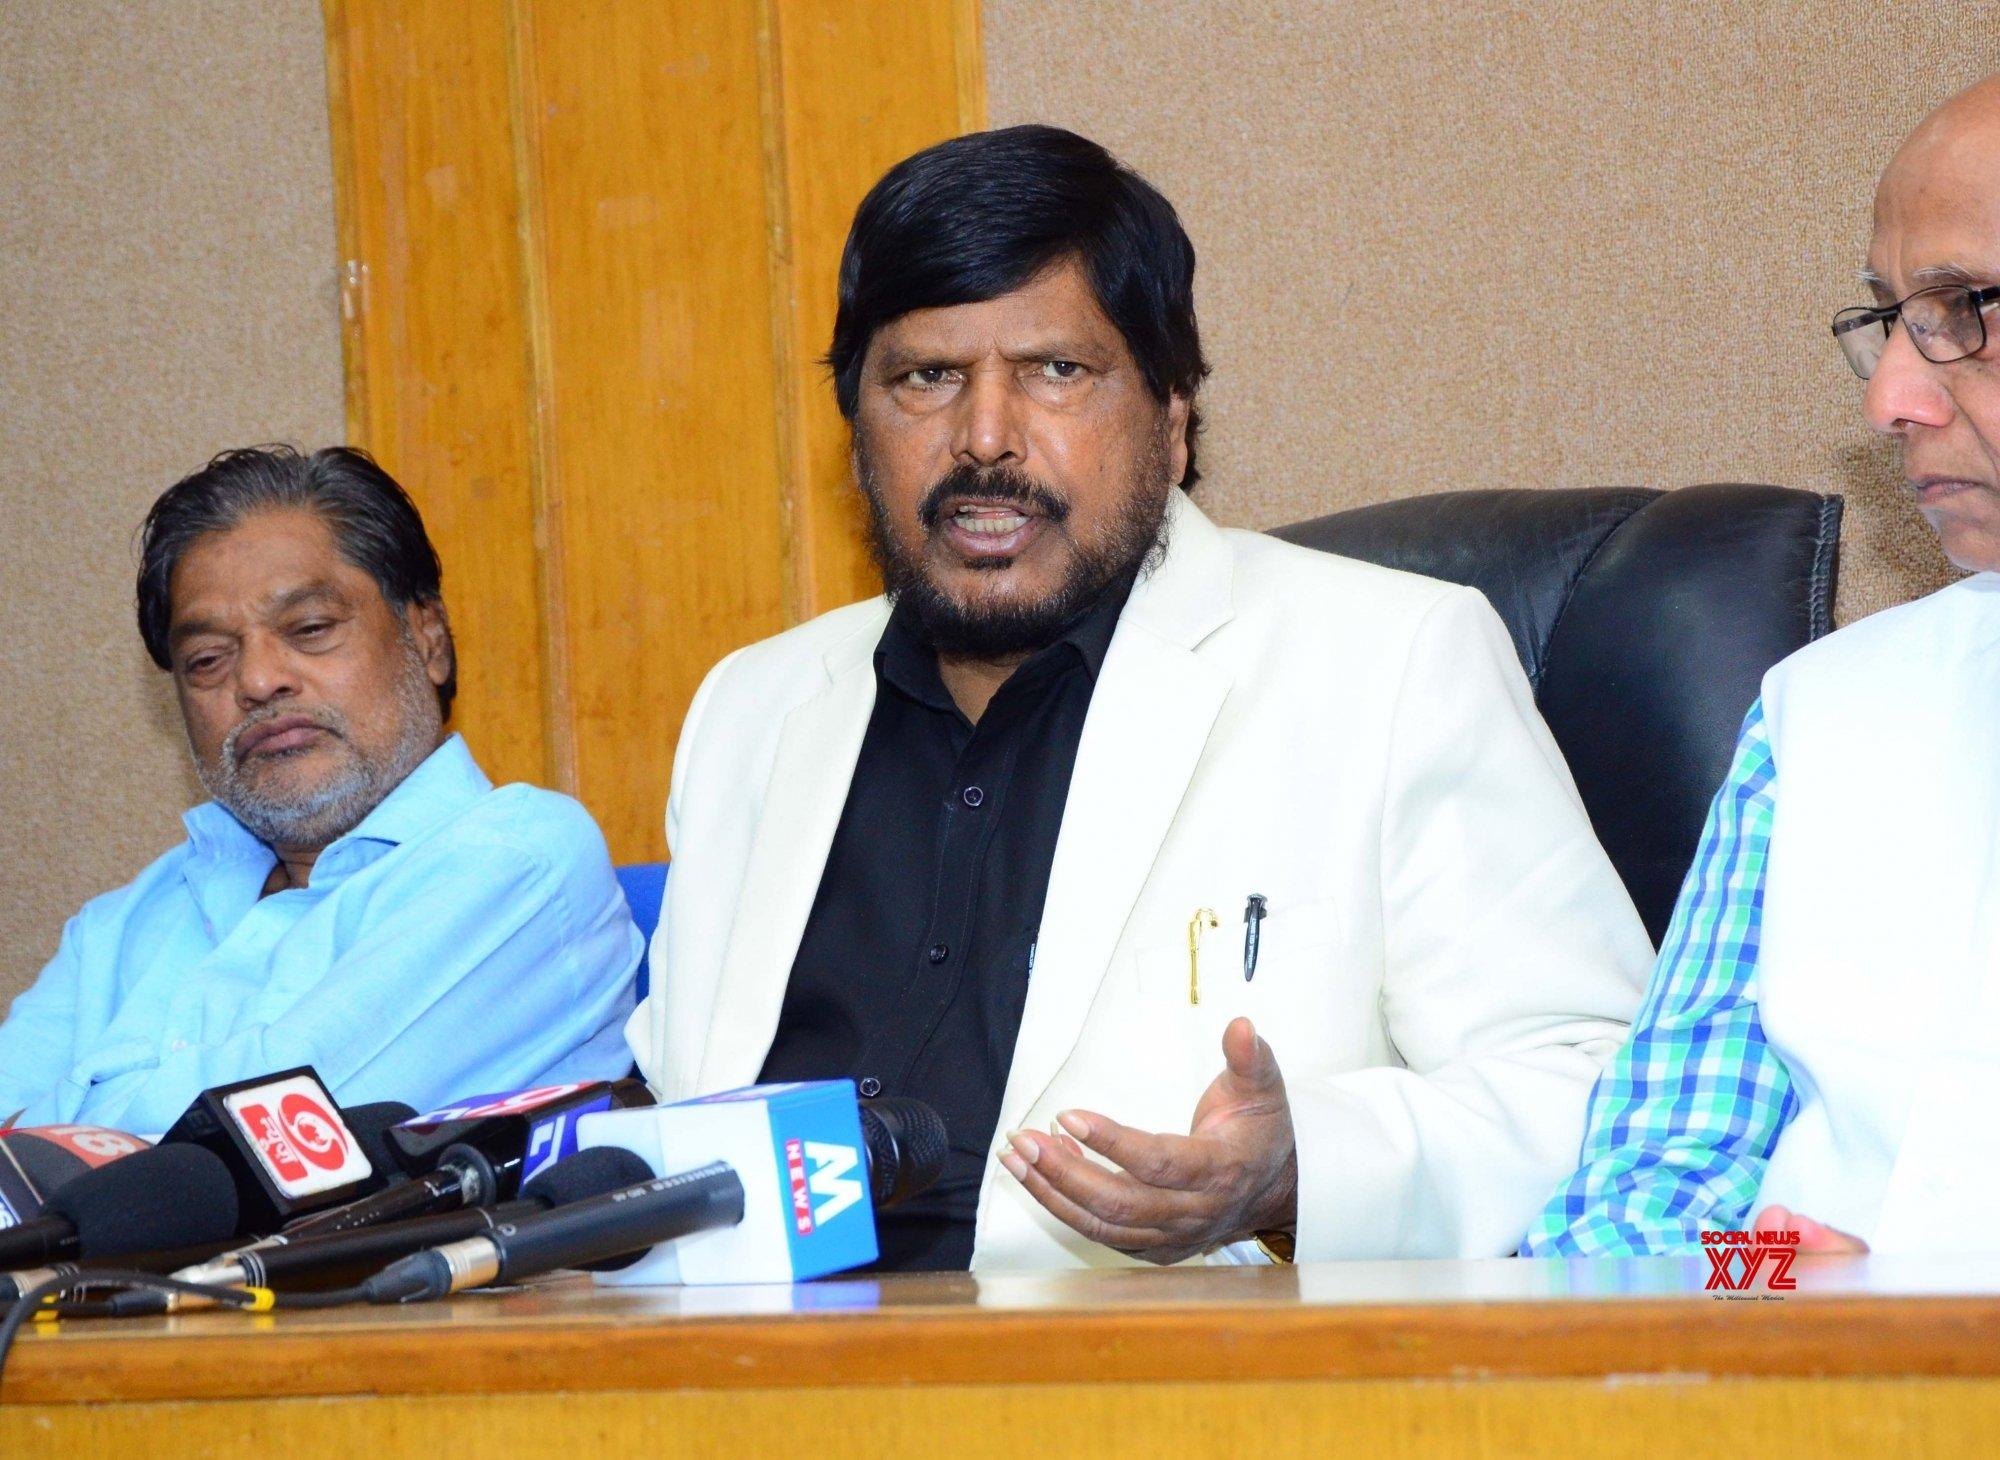 Nagpur: Ramdas Athawale's press conference #Gallery